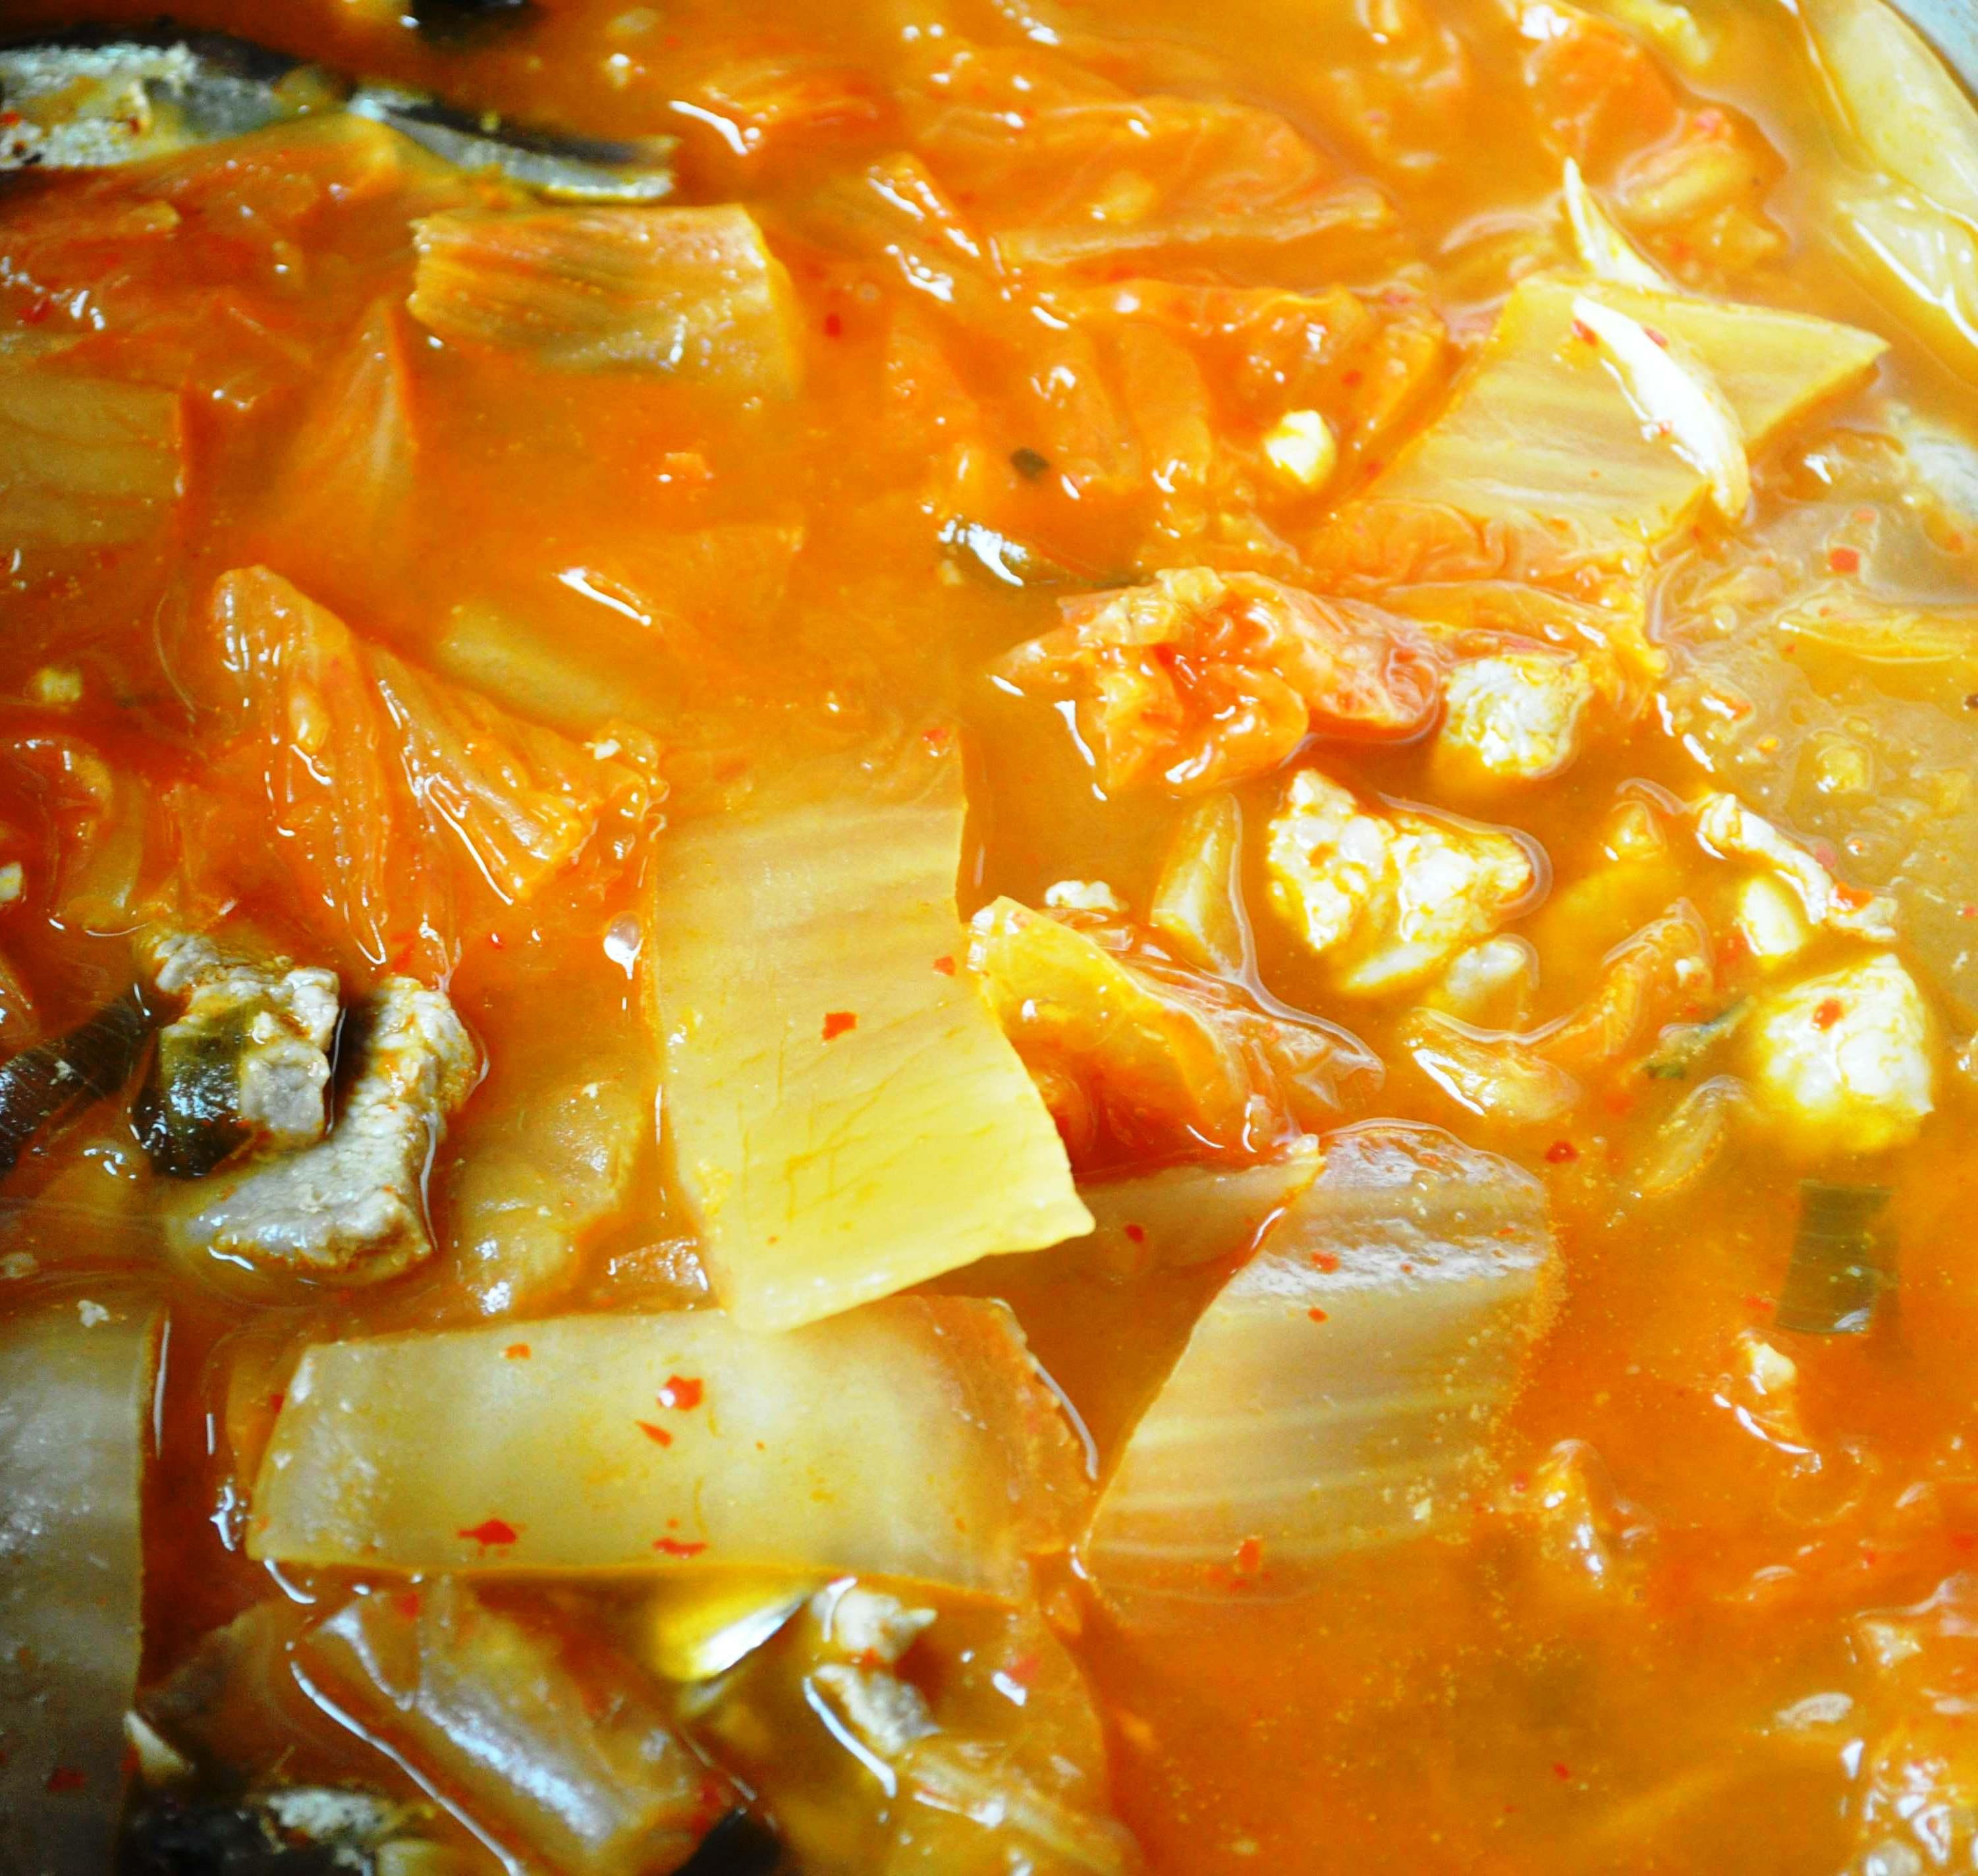 kimchi jjigae before